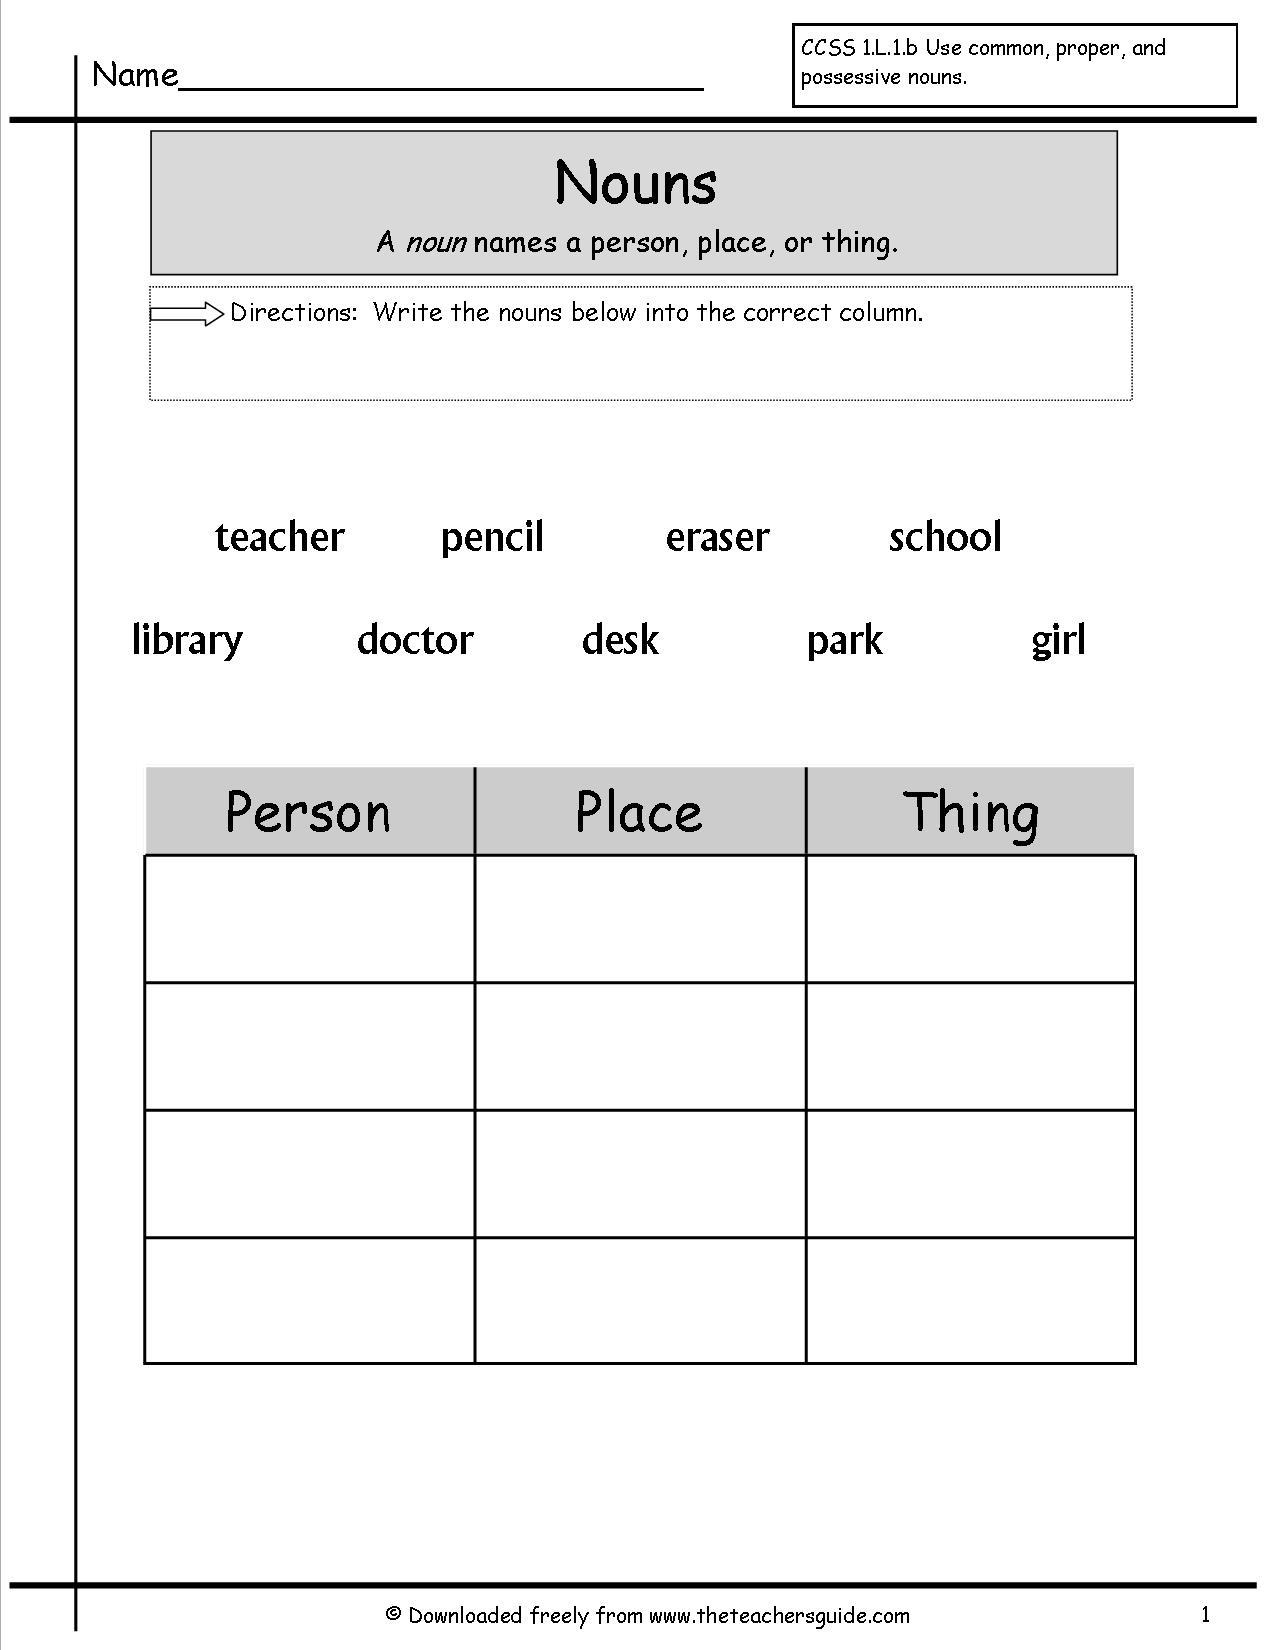 15 Best Images Of Noun Worksheets For Kindergarten